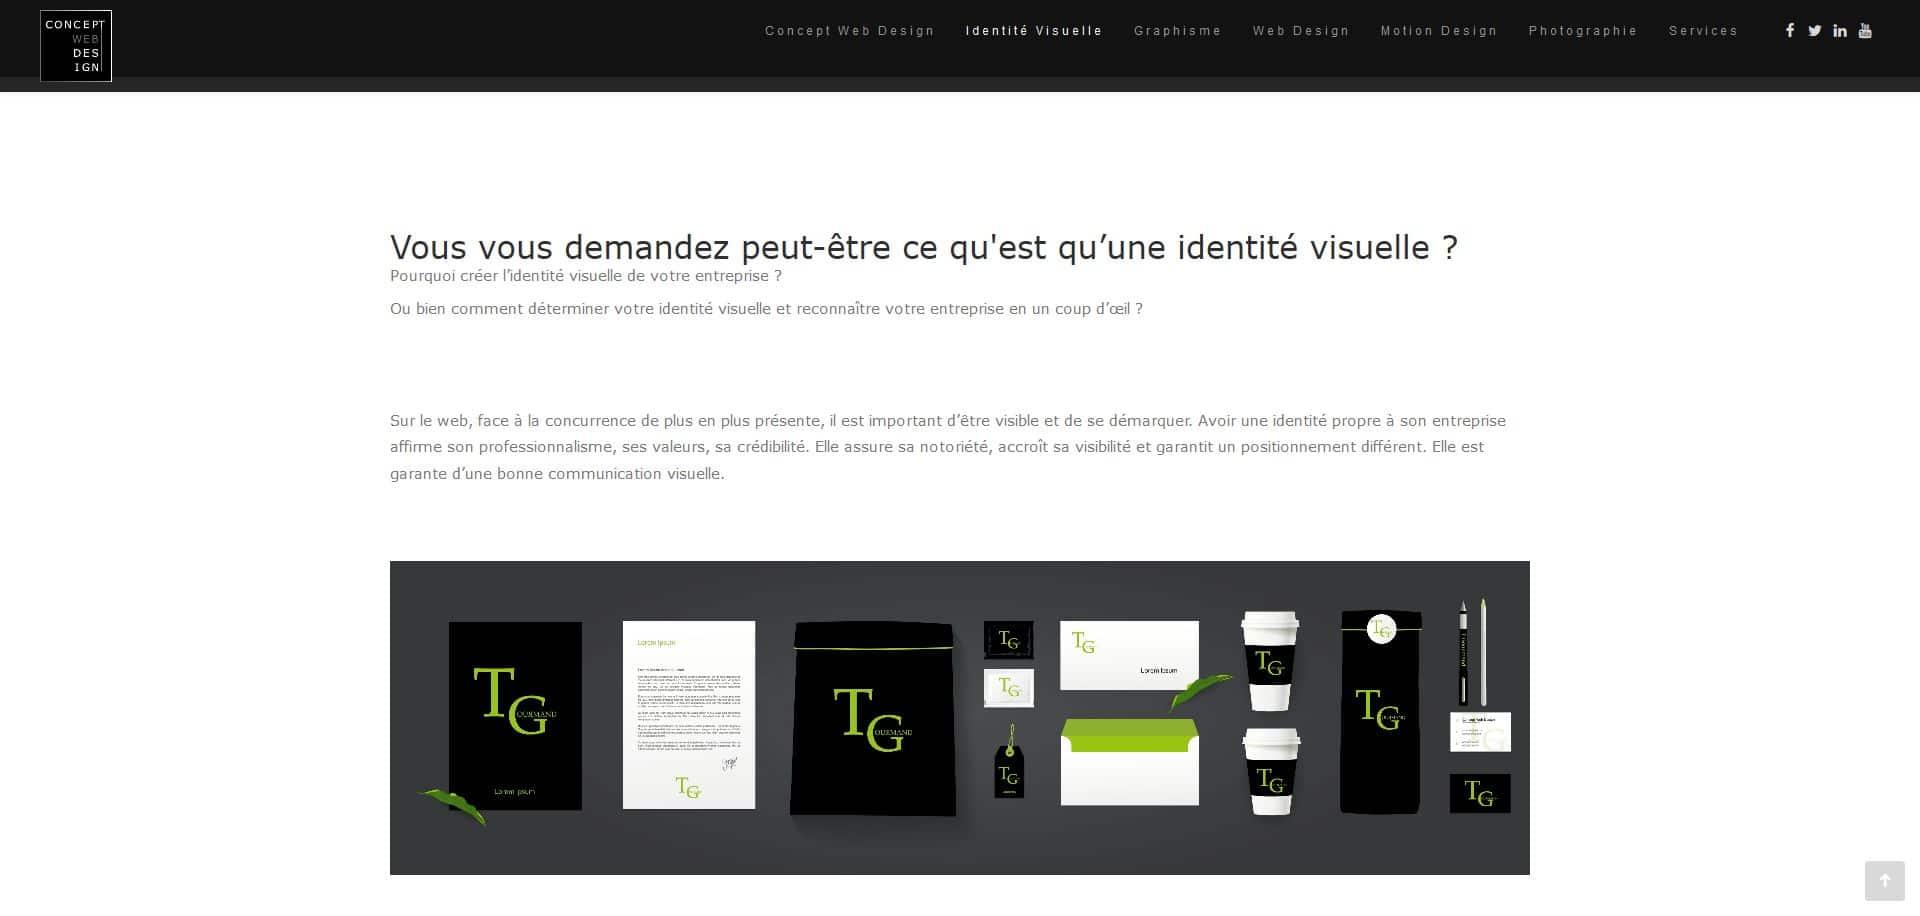 concept-web-design-identite-visuelle